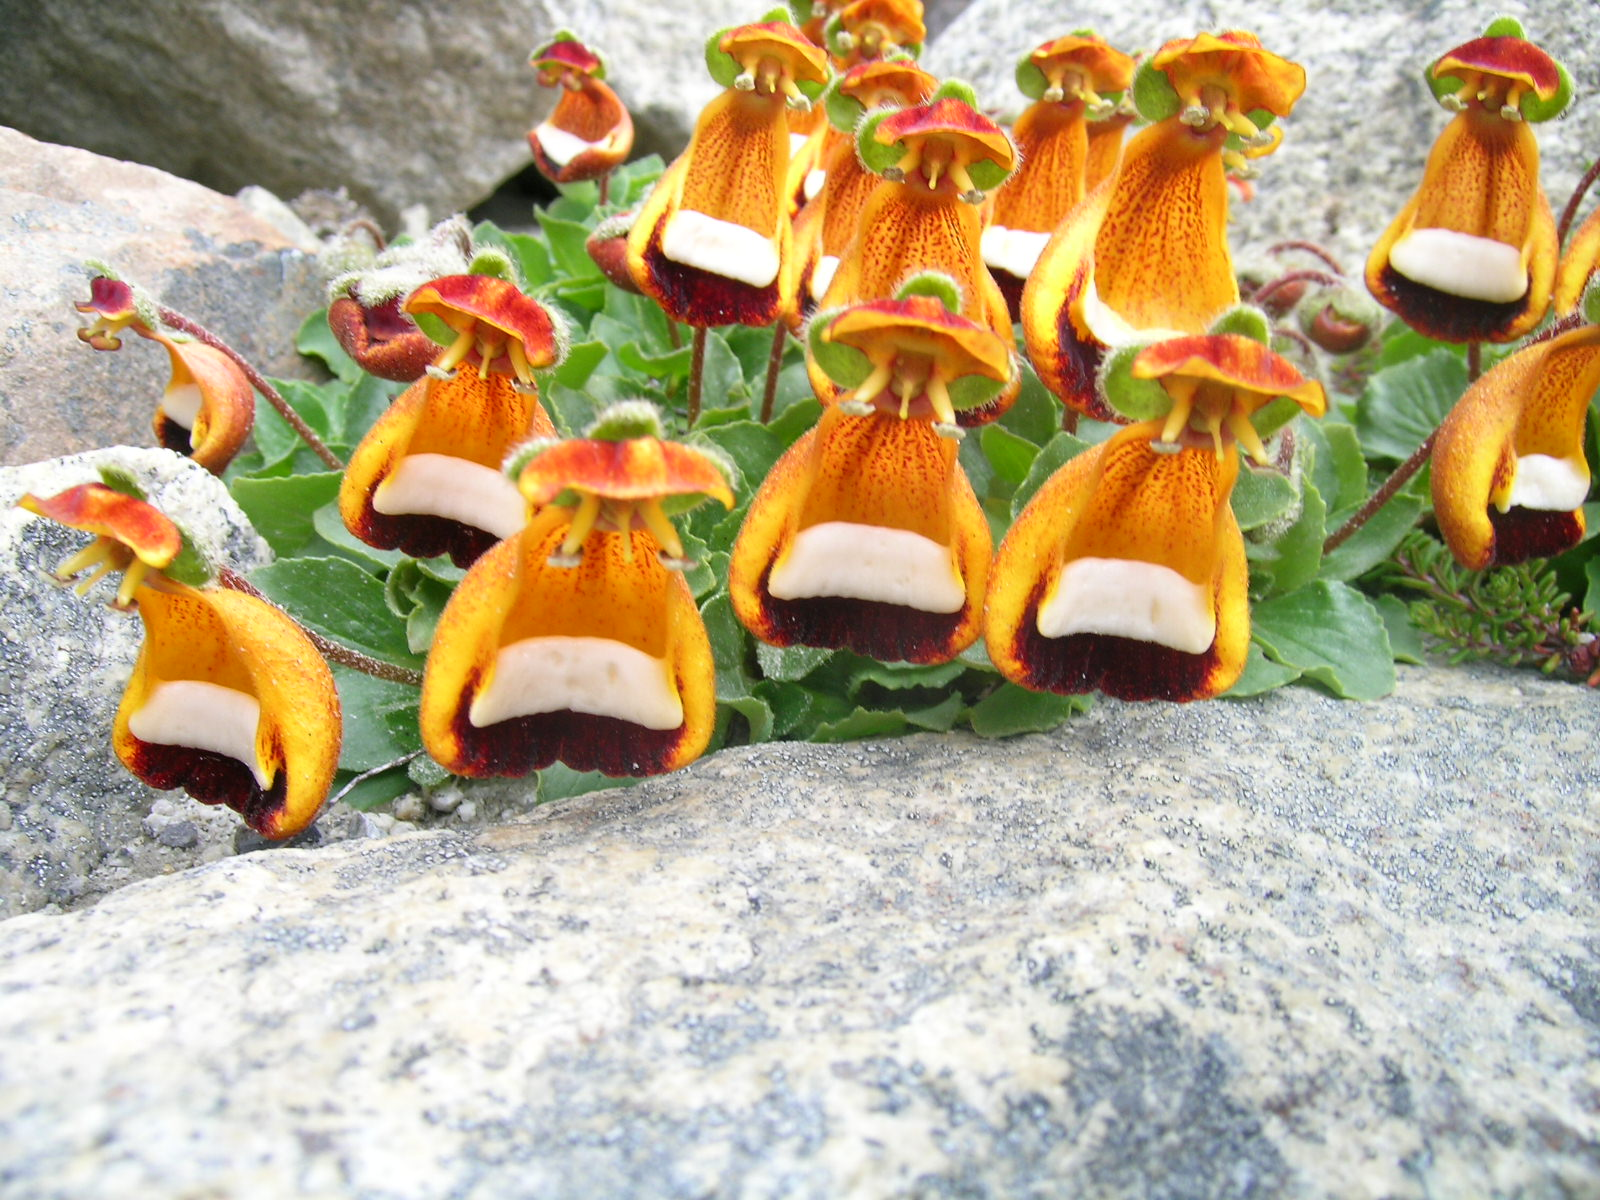 Кальцеолярия  Calceolaria описание и уход на FloralWorldru